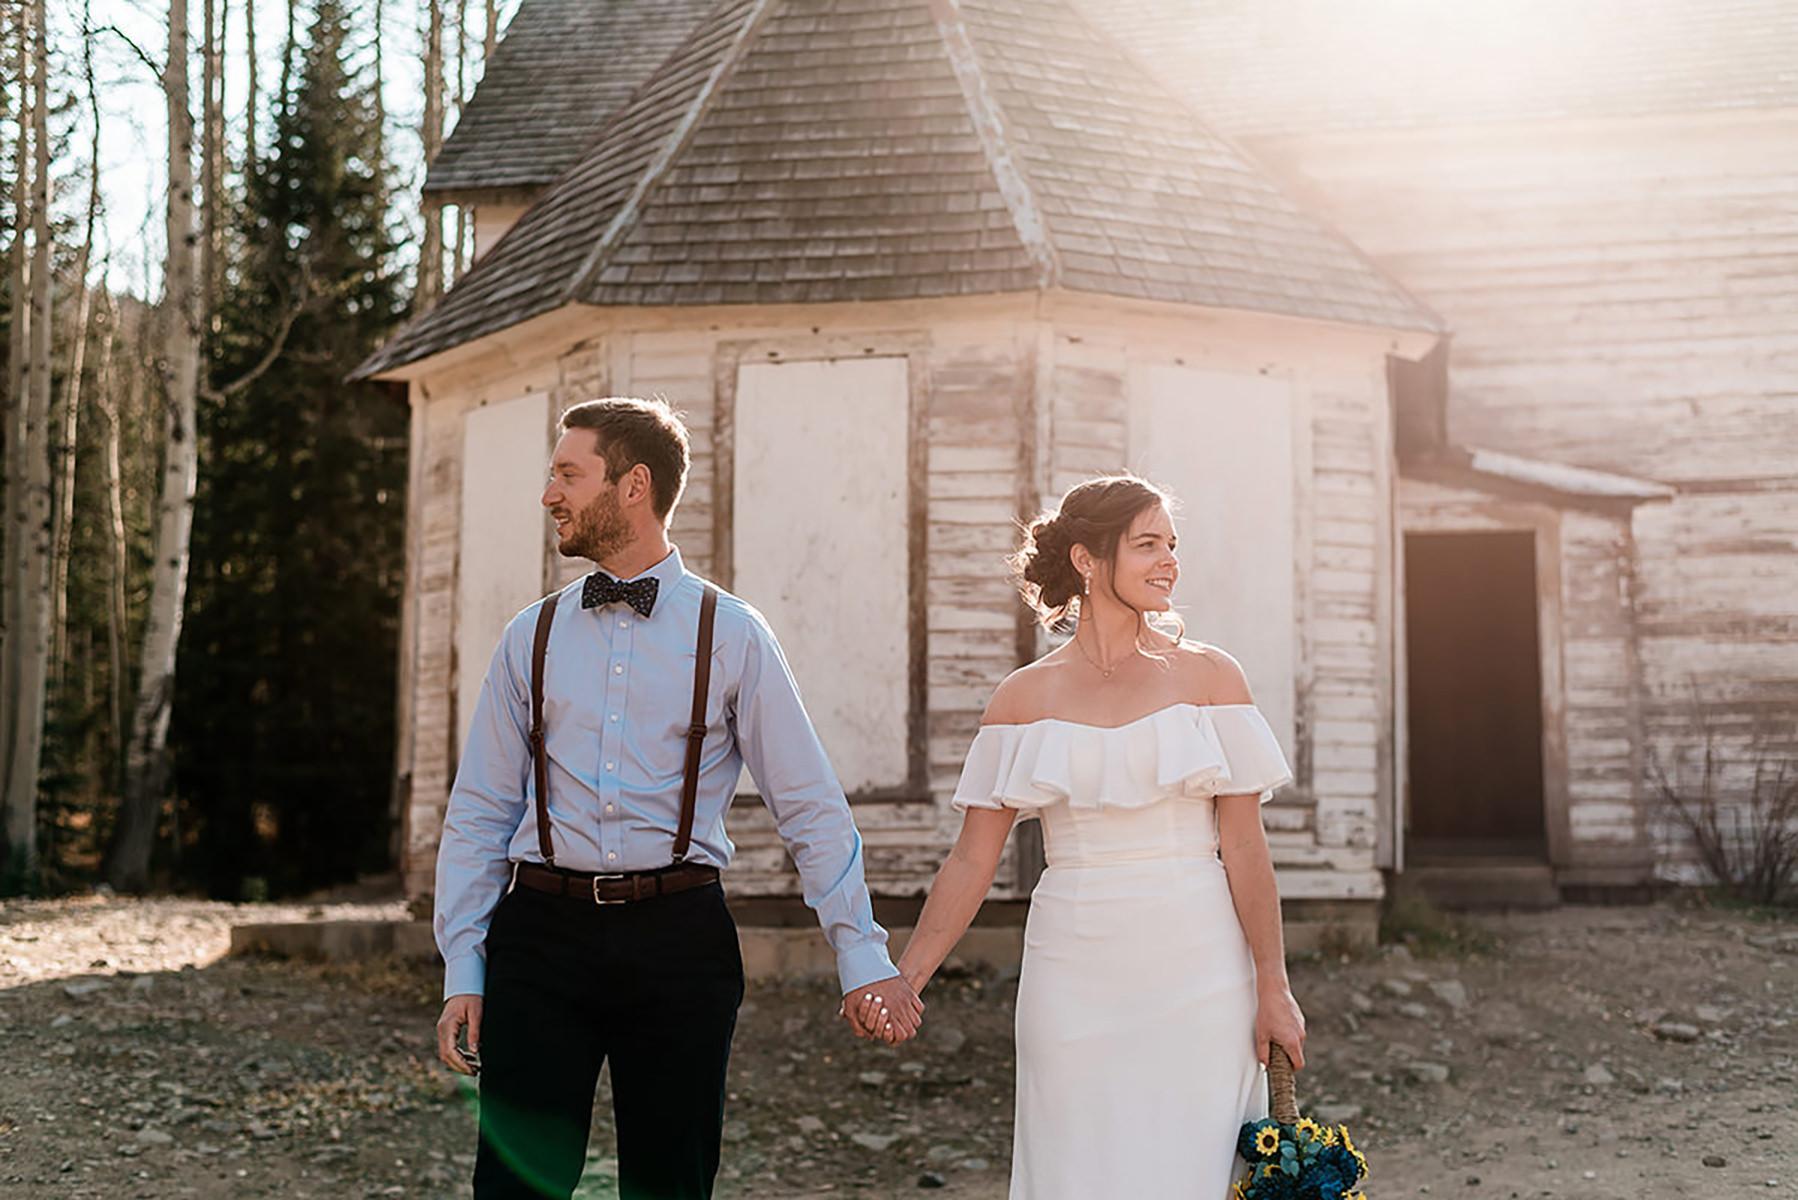 Amanda Matilda Photography on WED West Slope - Grand Junction Wedding Photography